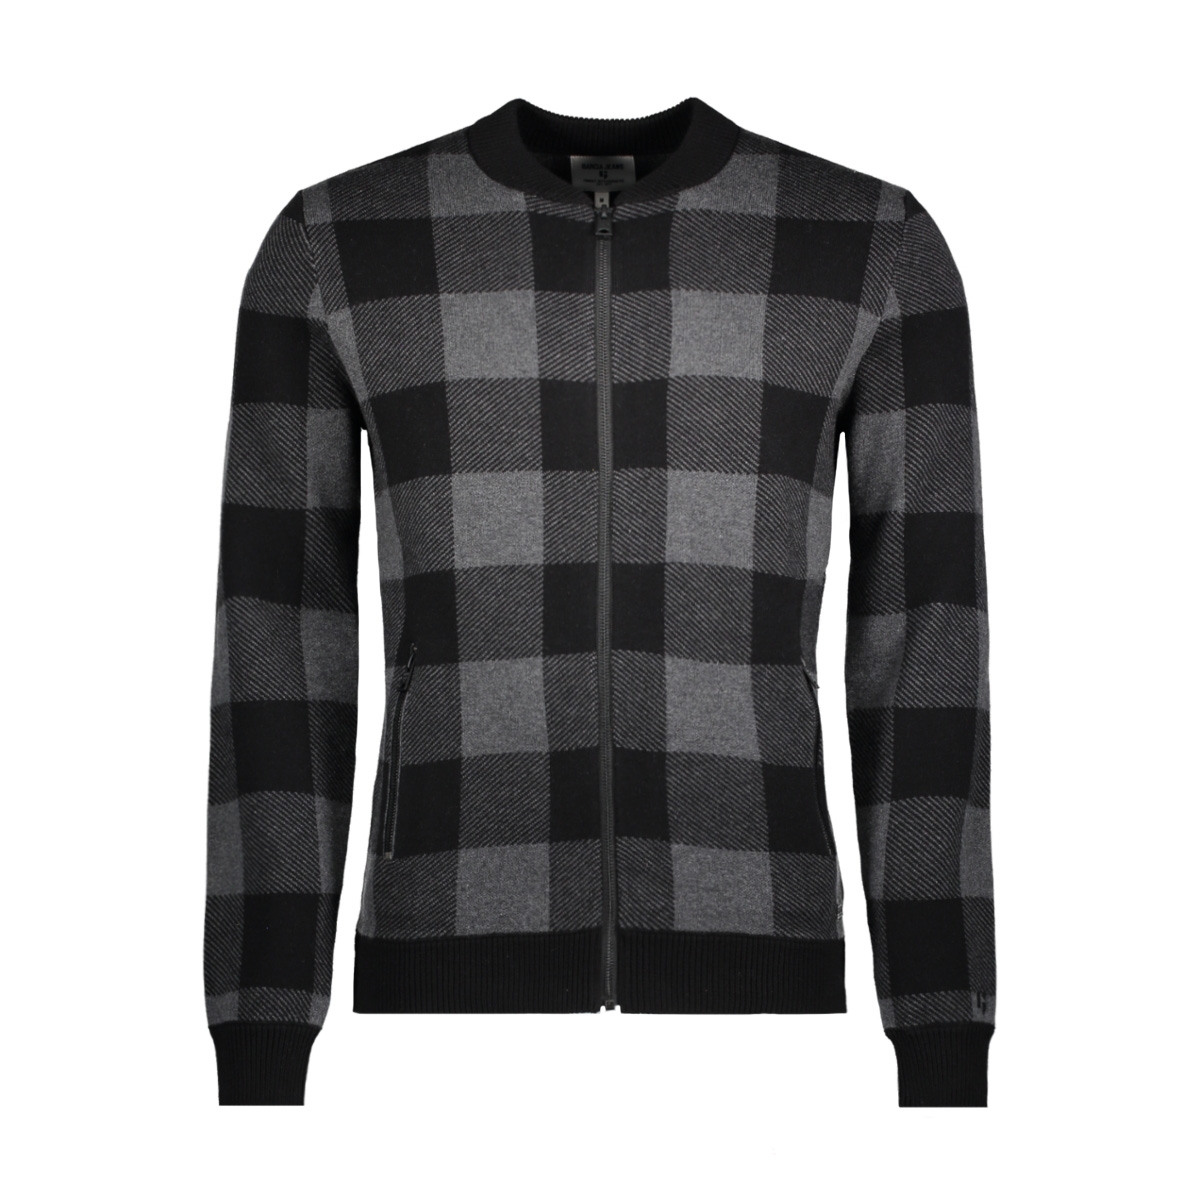 u81057 garcia vest 60 black